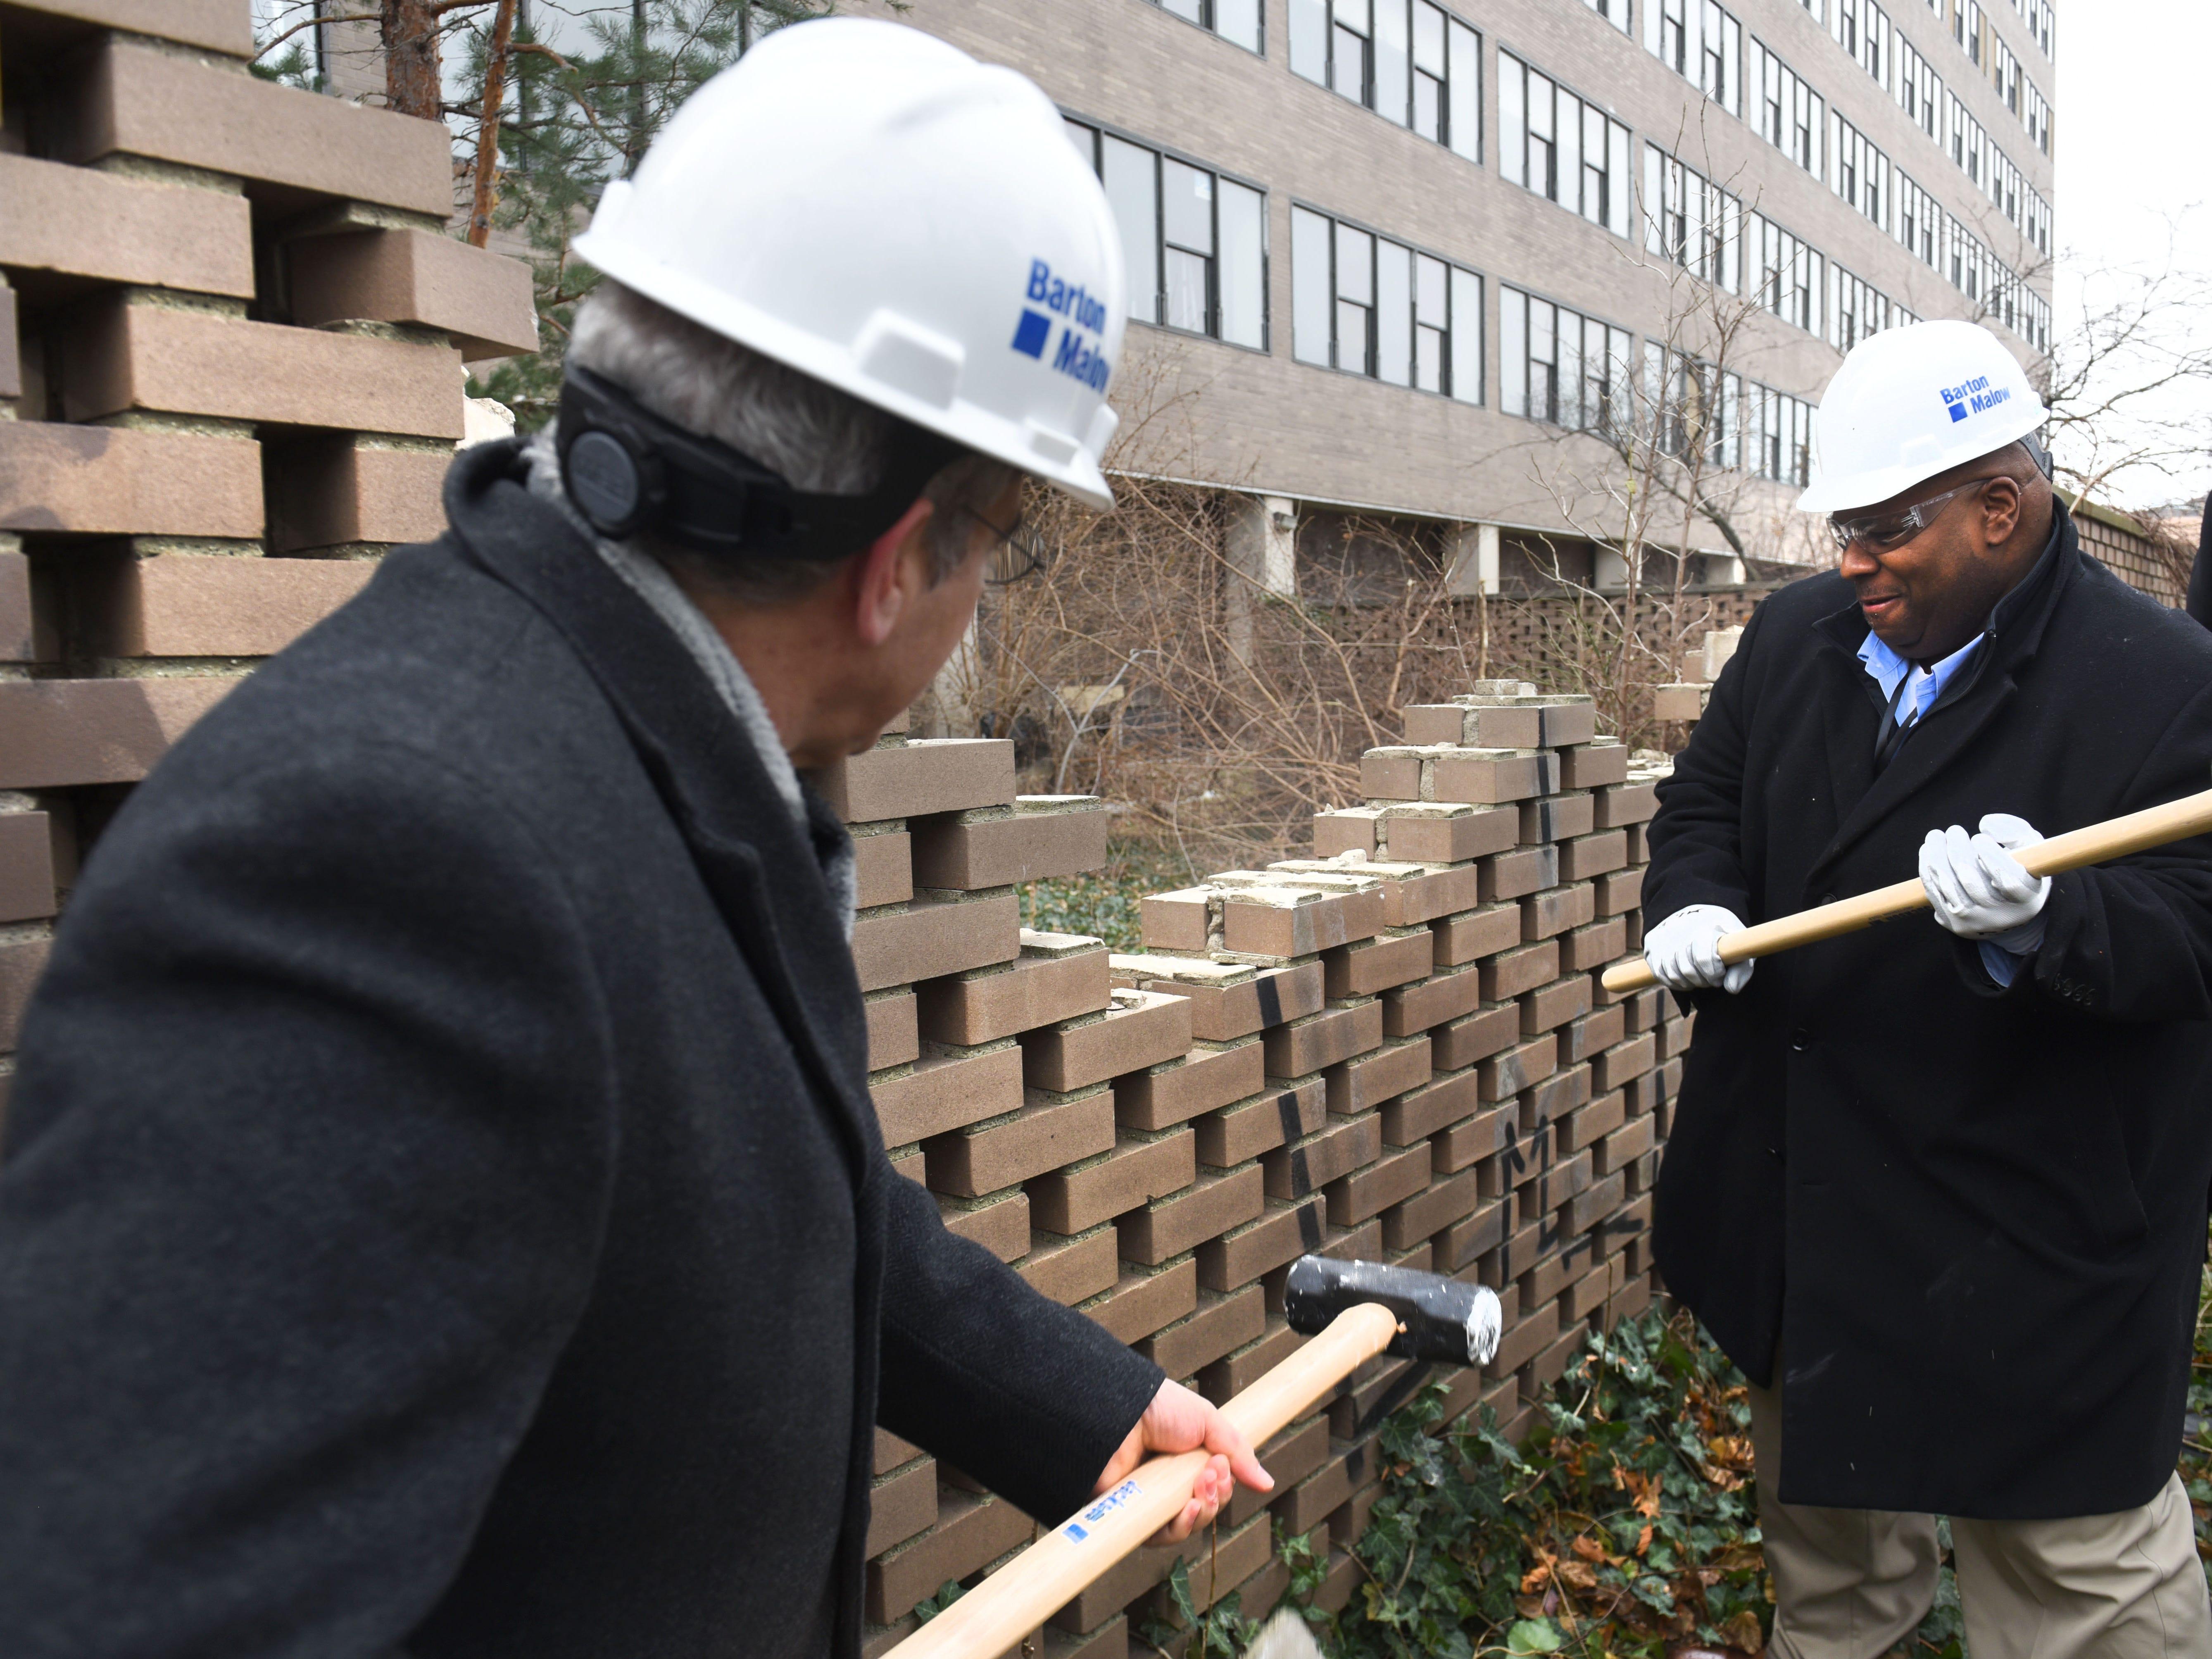 Officials kick off demolition at site of $108M Lafayette West development